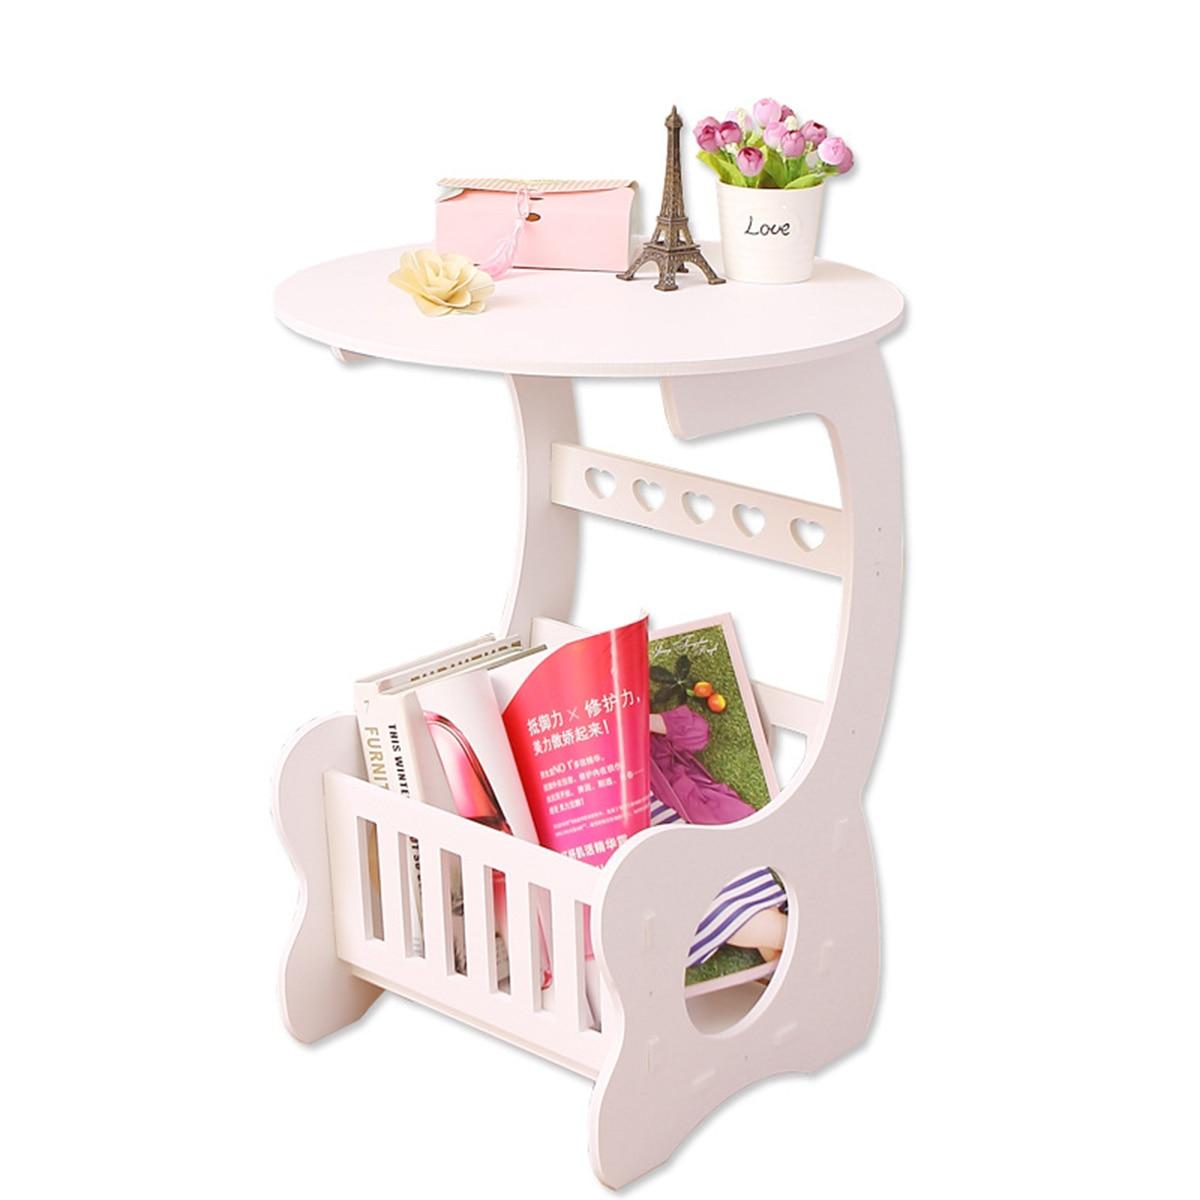 Desk Storage-Shelf Coffee-End Round-Edge Living-Room Modern Wpc-Material S/mini-Size